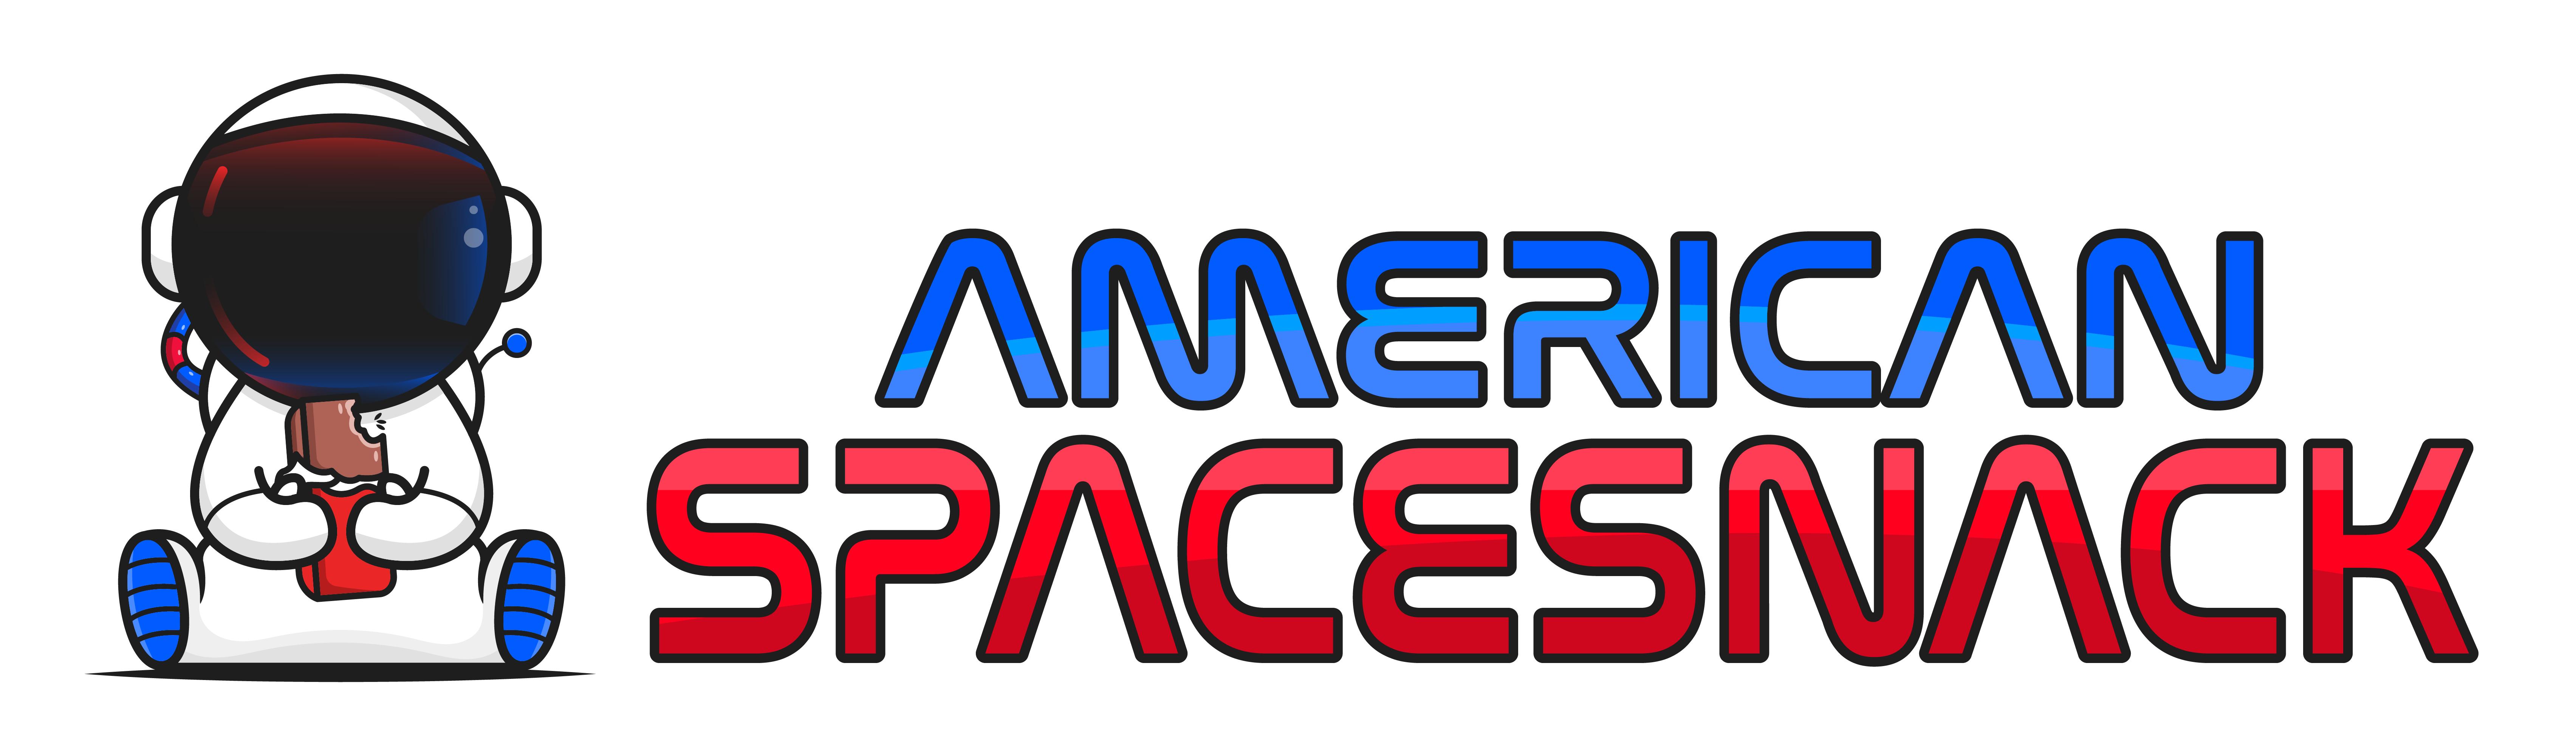 Snack Americani Dolci e Salati | American Spacesnack